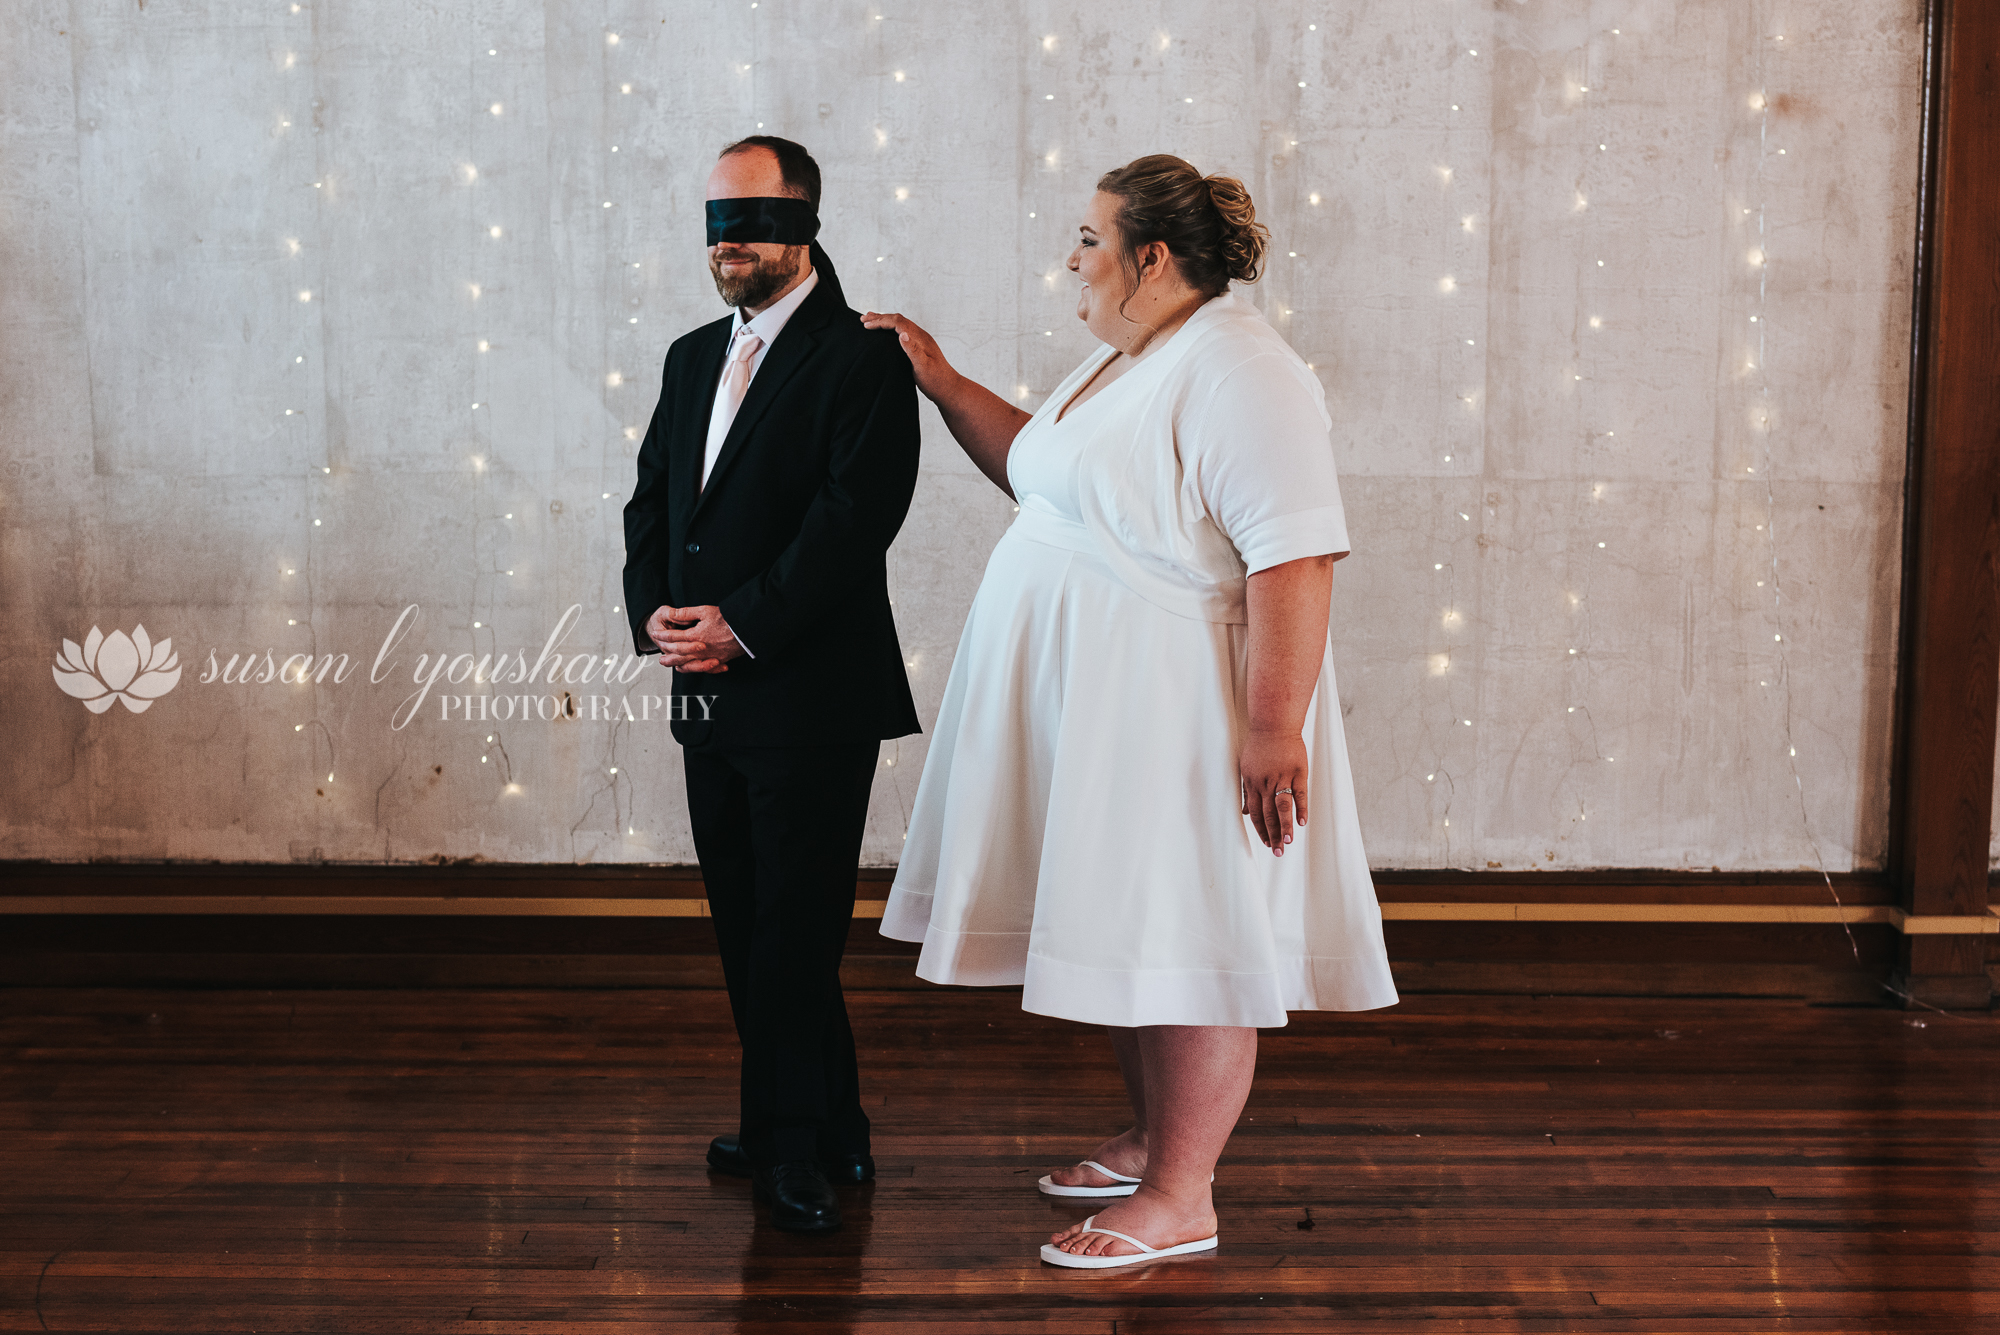 Bill and Sarah Wedding Photos 06-08-2019 SLY Photography -6.jpg